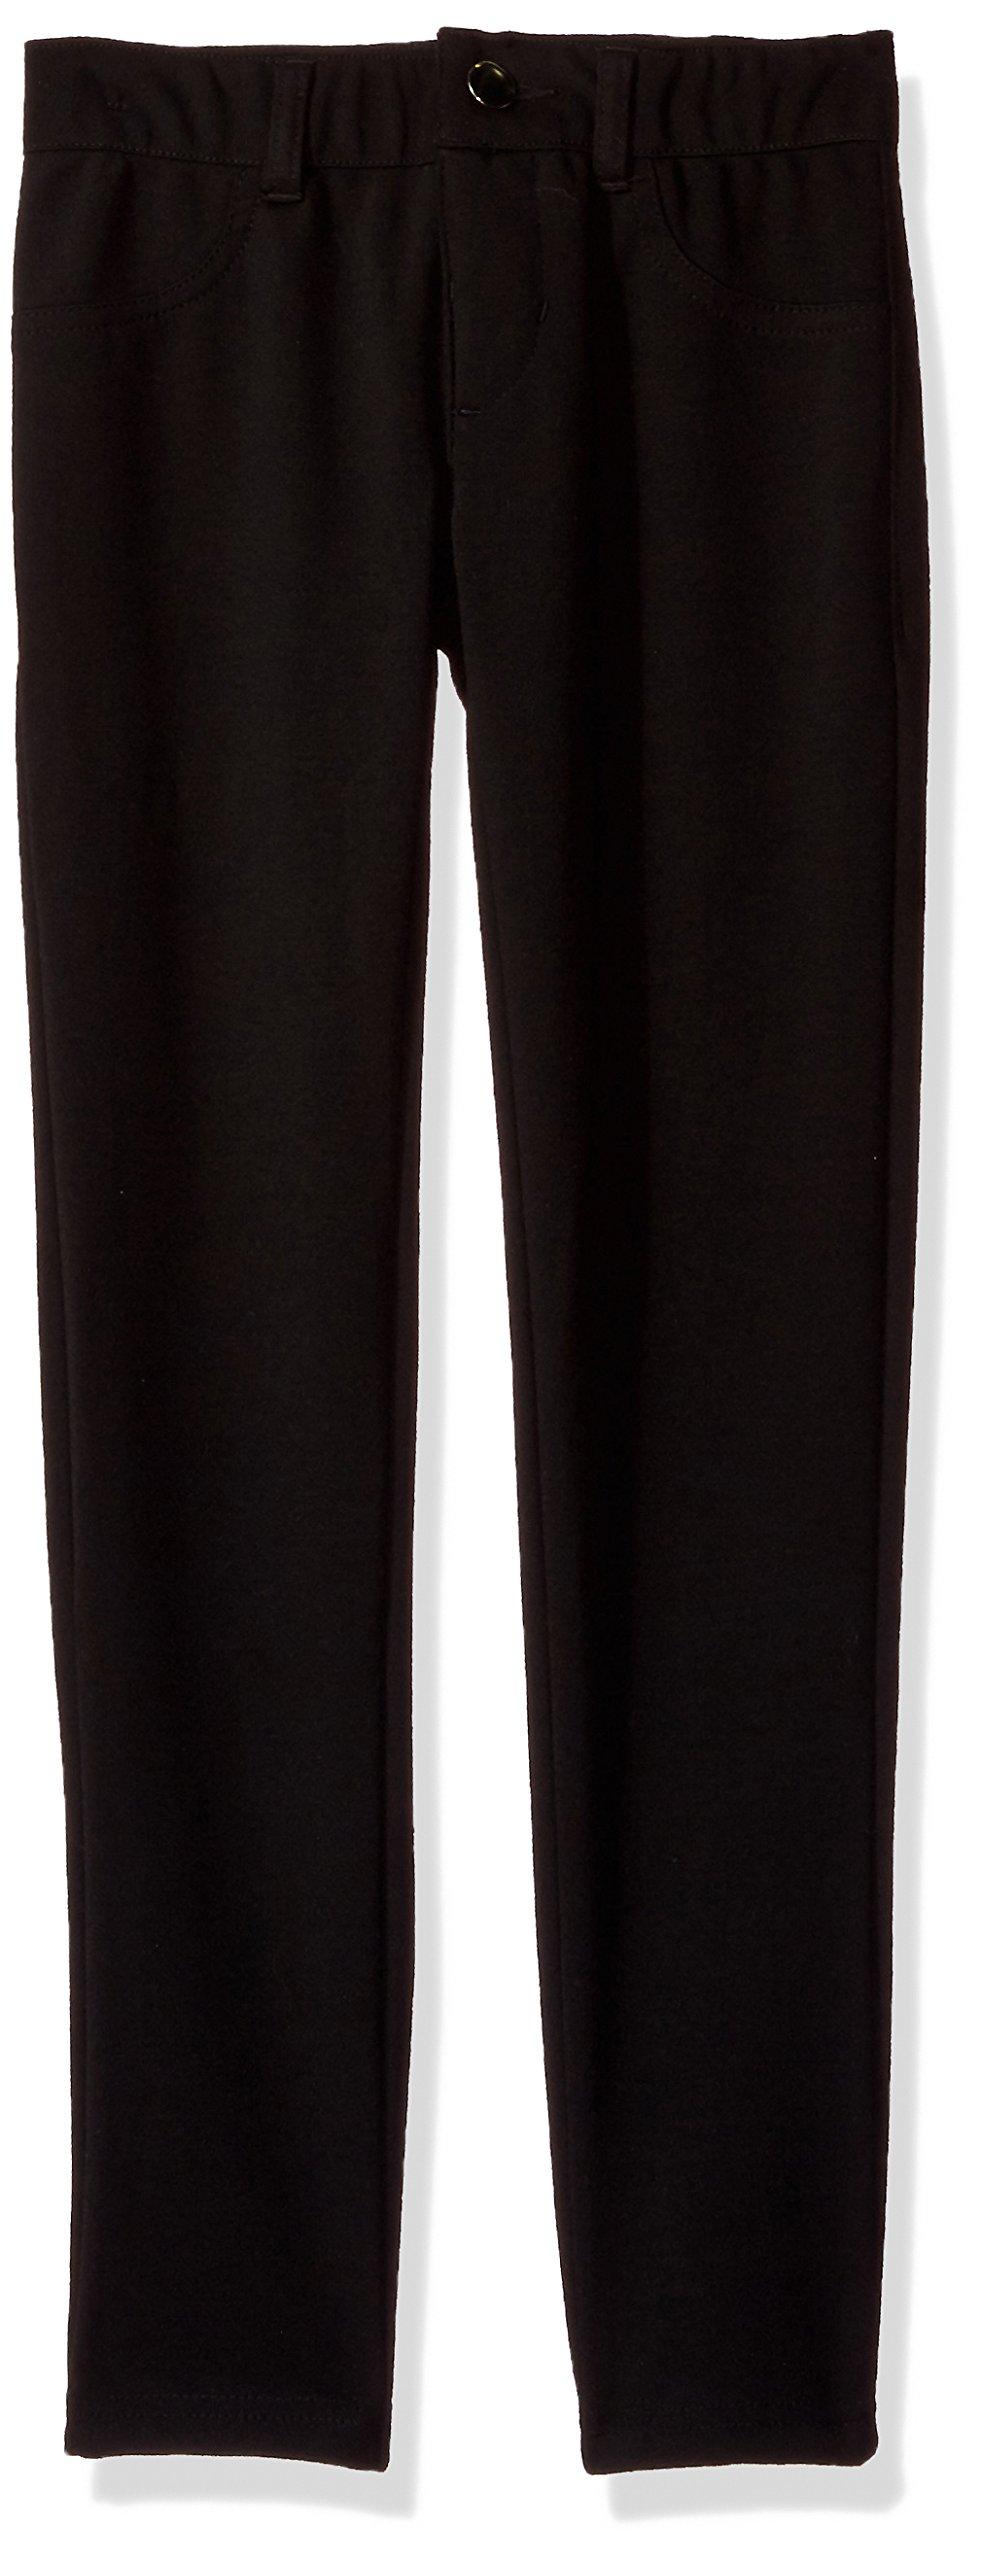 My Michelle Big Girls' Ponte Pant, Black, L